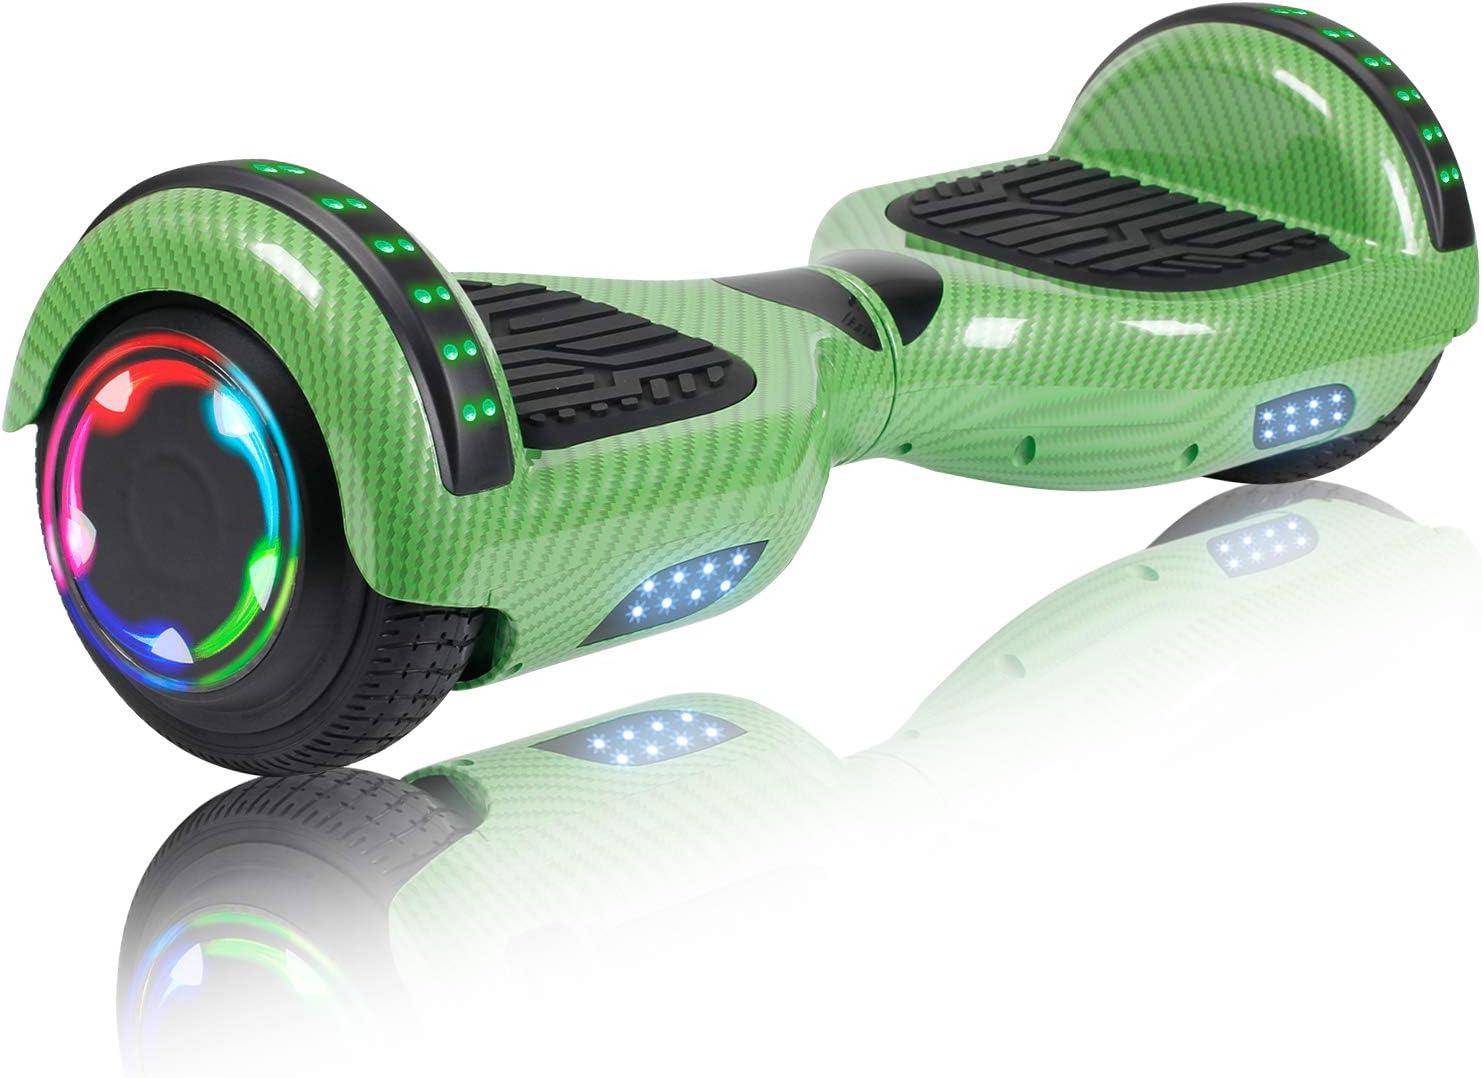 SISIGAD Self Balancing Scooter